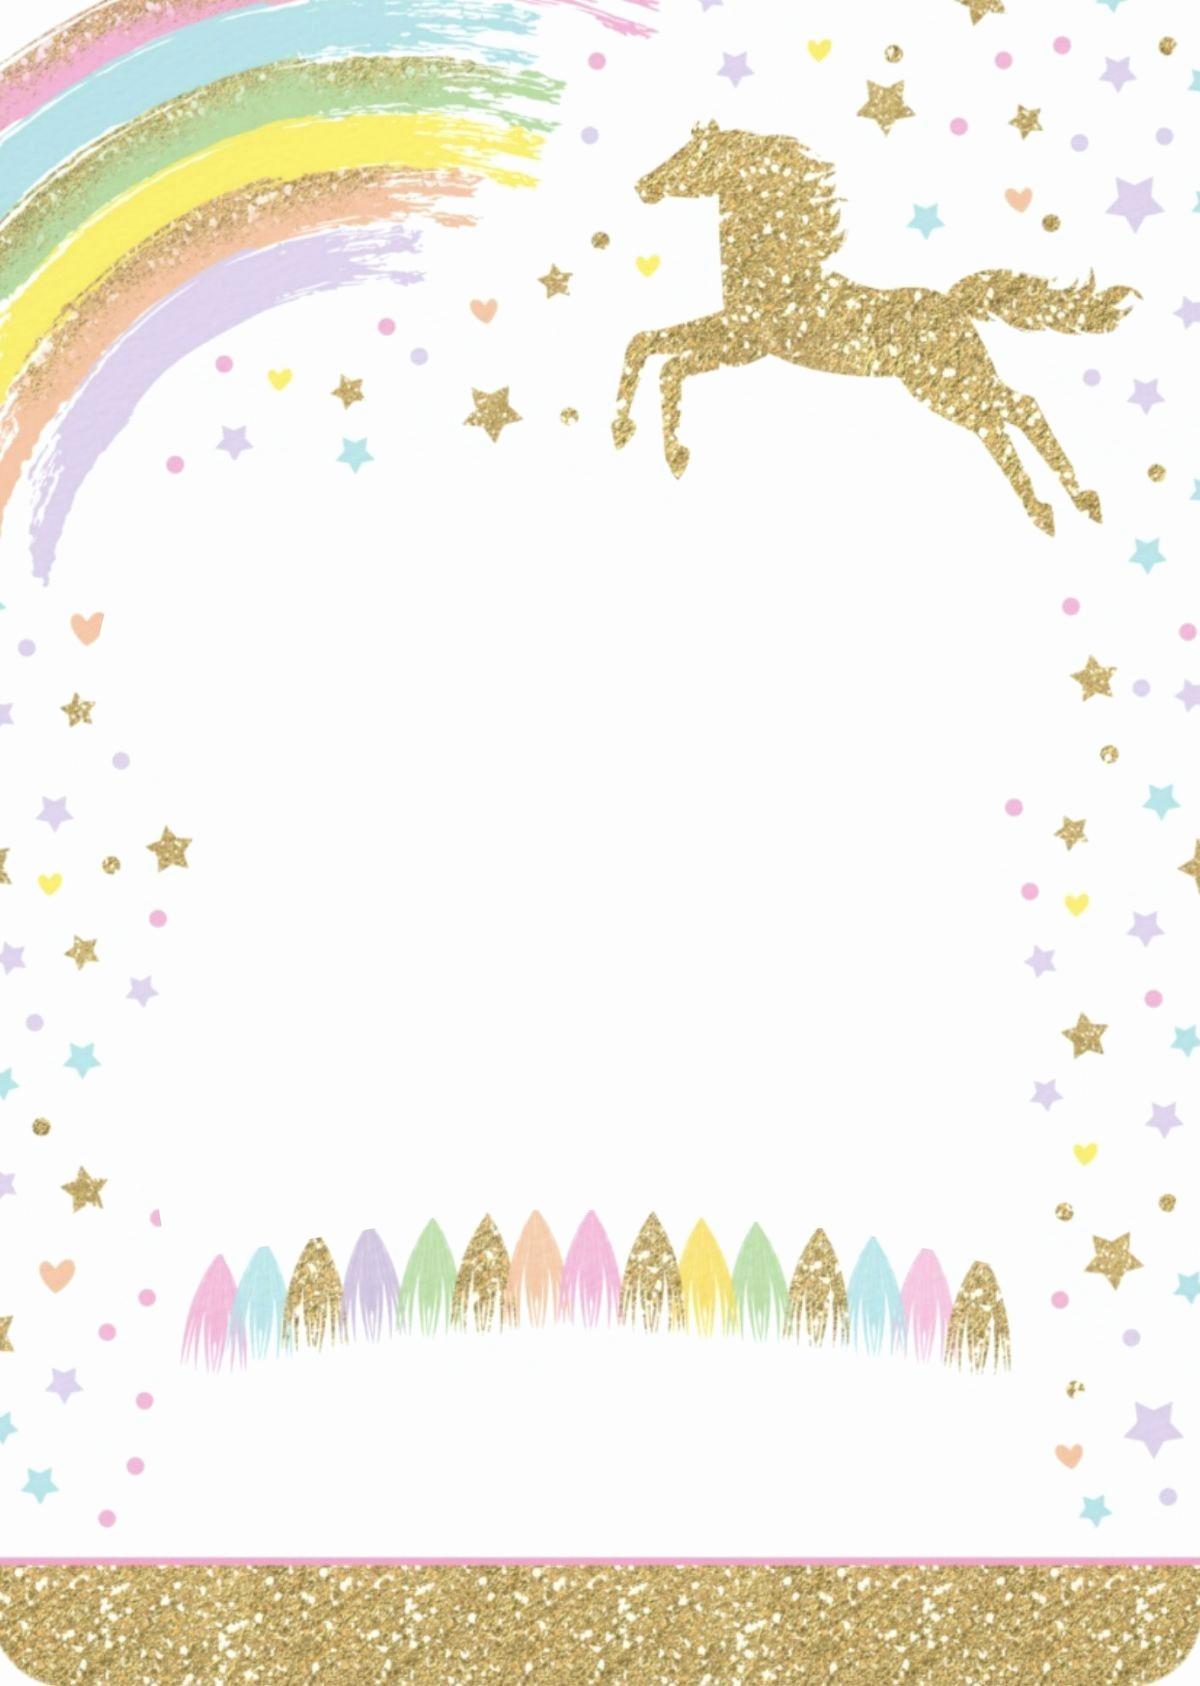 Unicorn Invitation Template Free Beautiful 8 Magical Unicorn Birthday Invitations